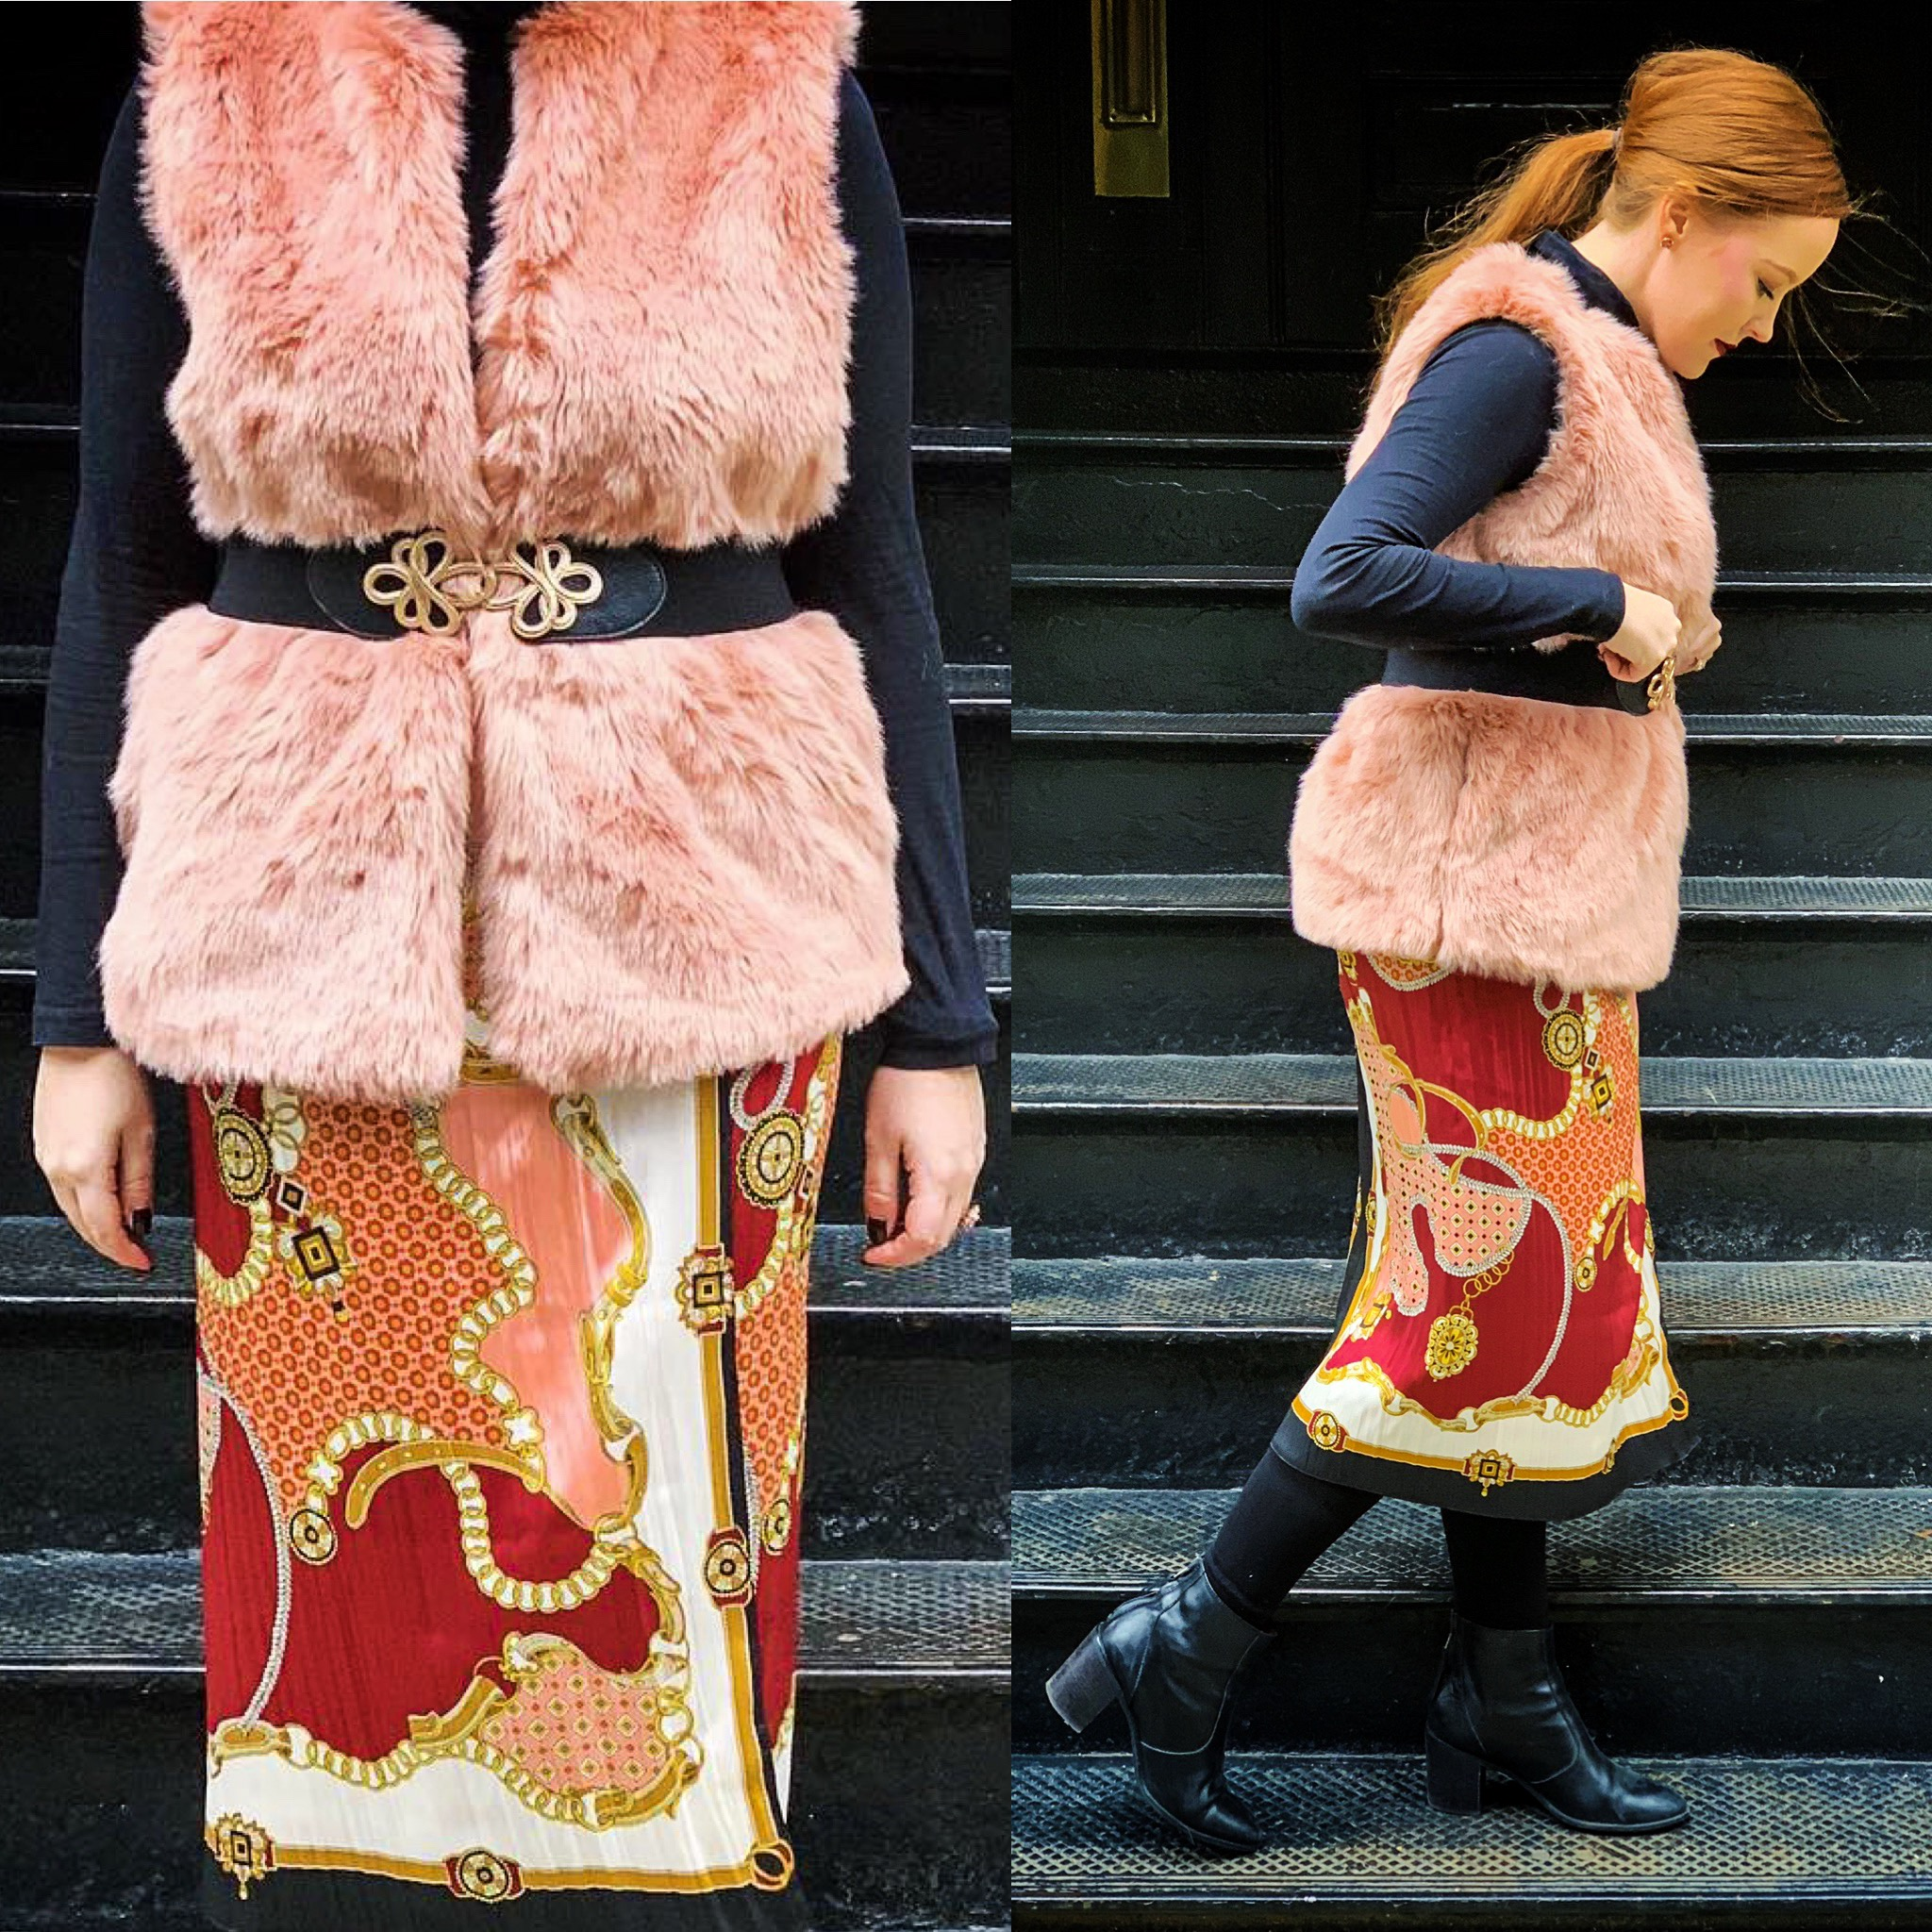 Belt: Fab'rik (out of stock), similar    here     Skirt: Zarac (out of stock), similar    here   ,    here   , and    here     Vest: Target (out of stock), similar    here